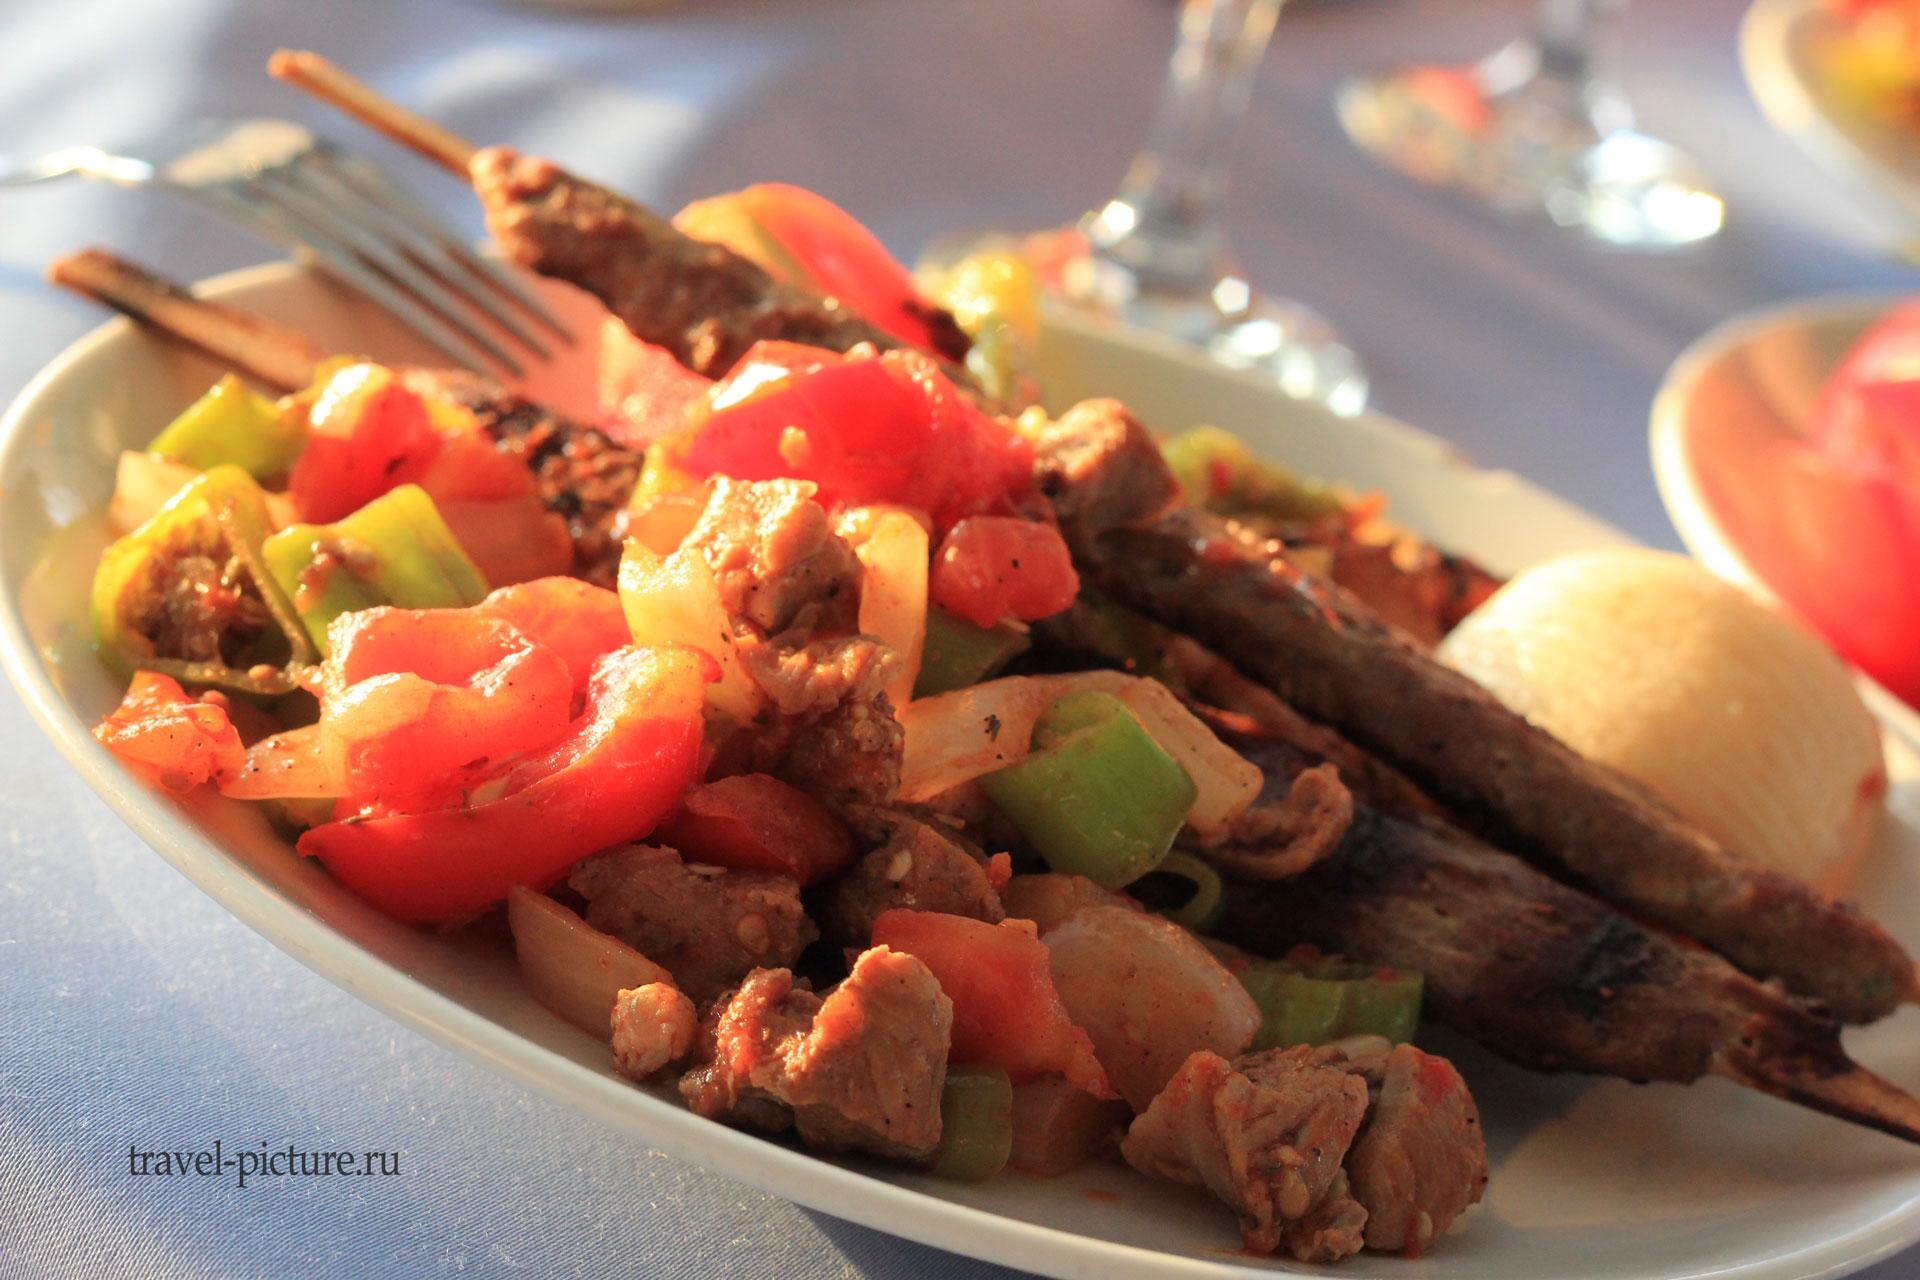 Фото блюд турецкой кухни